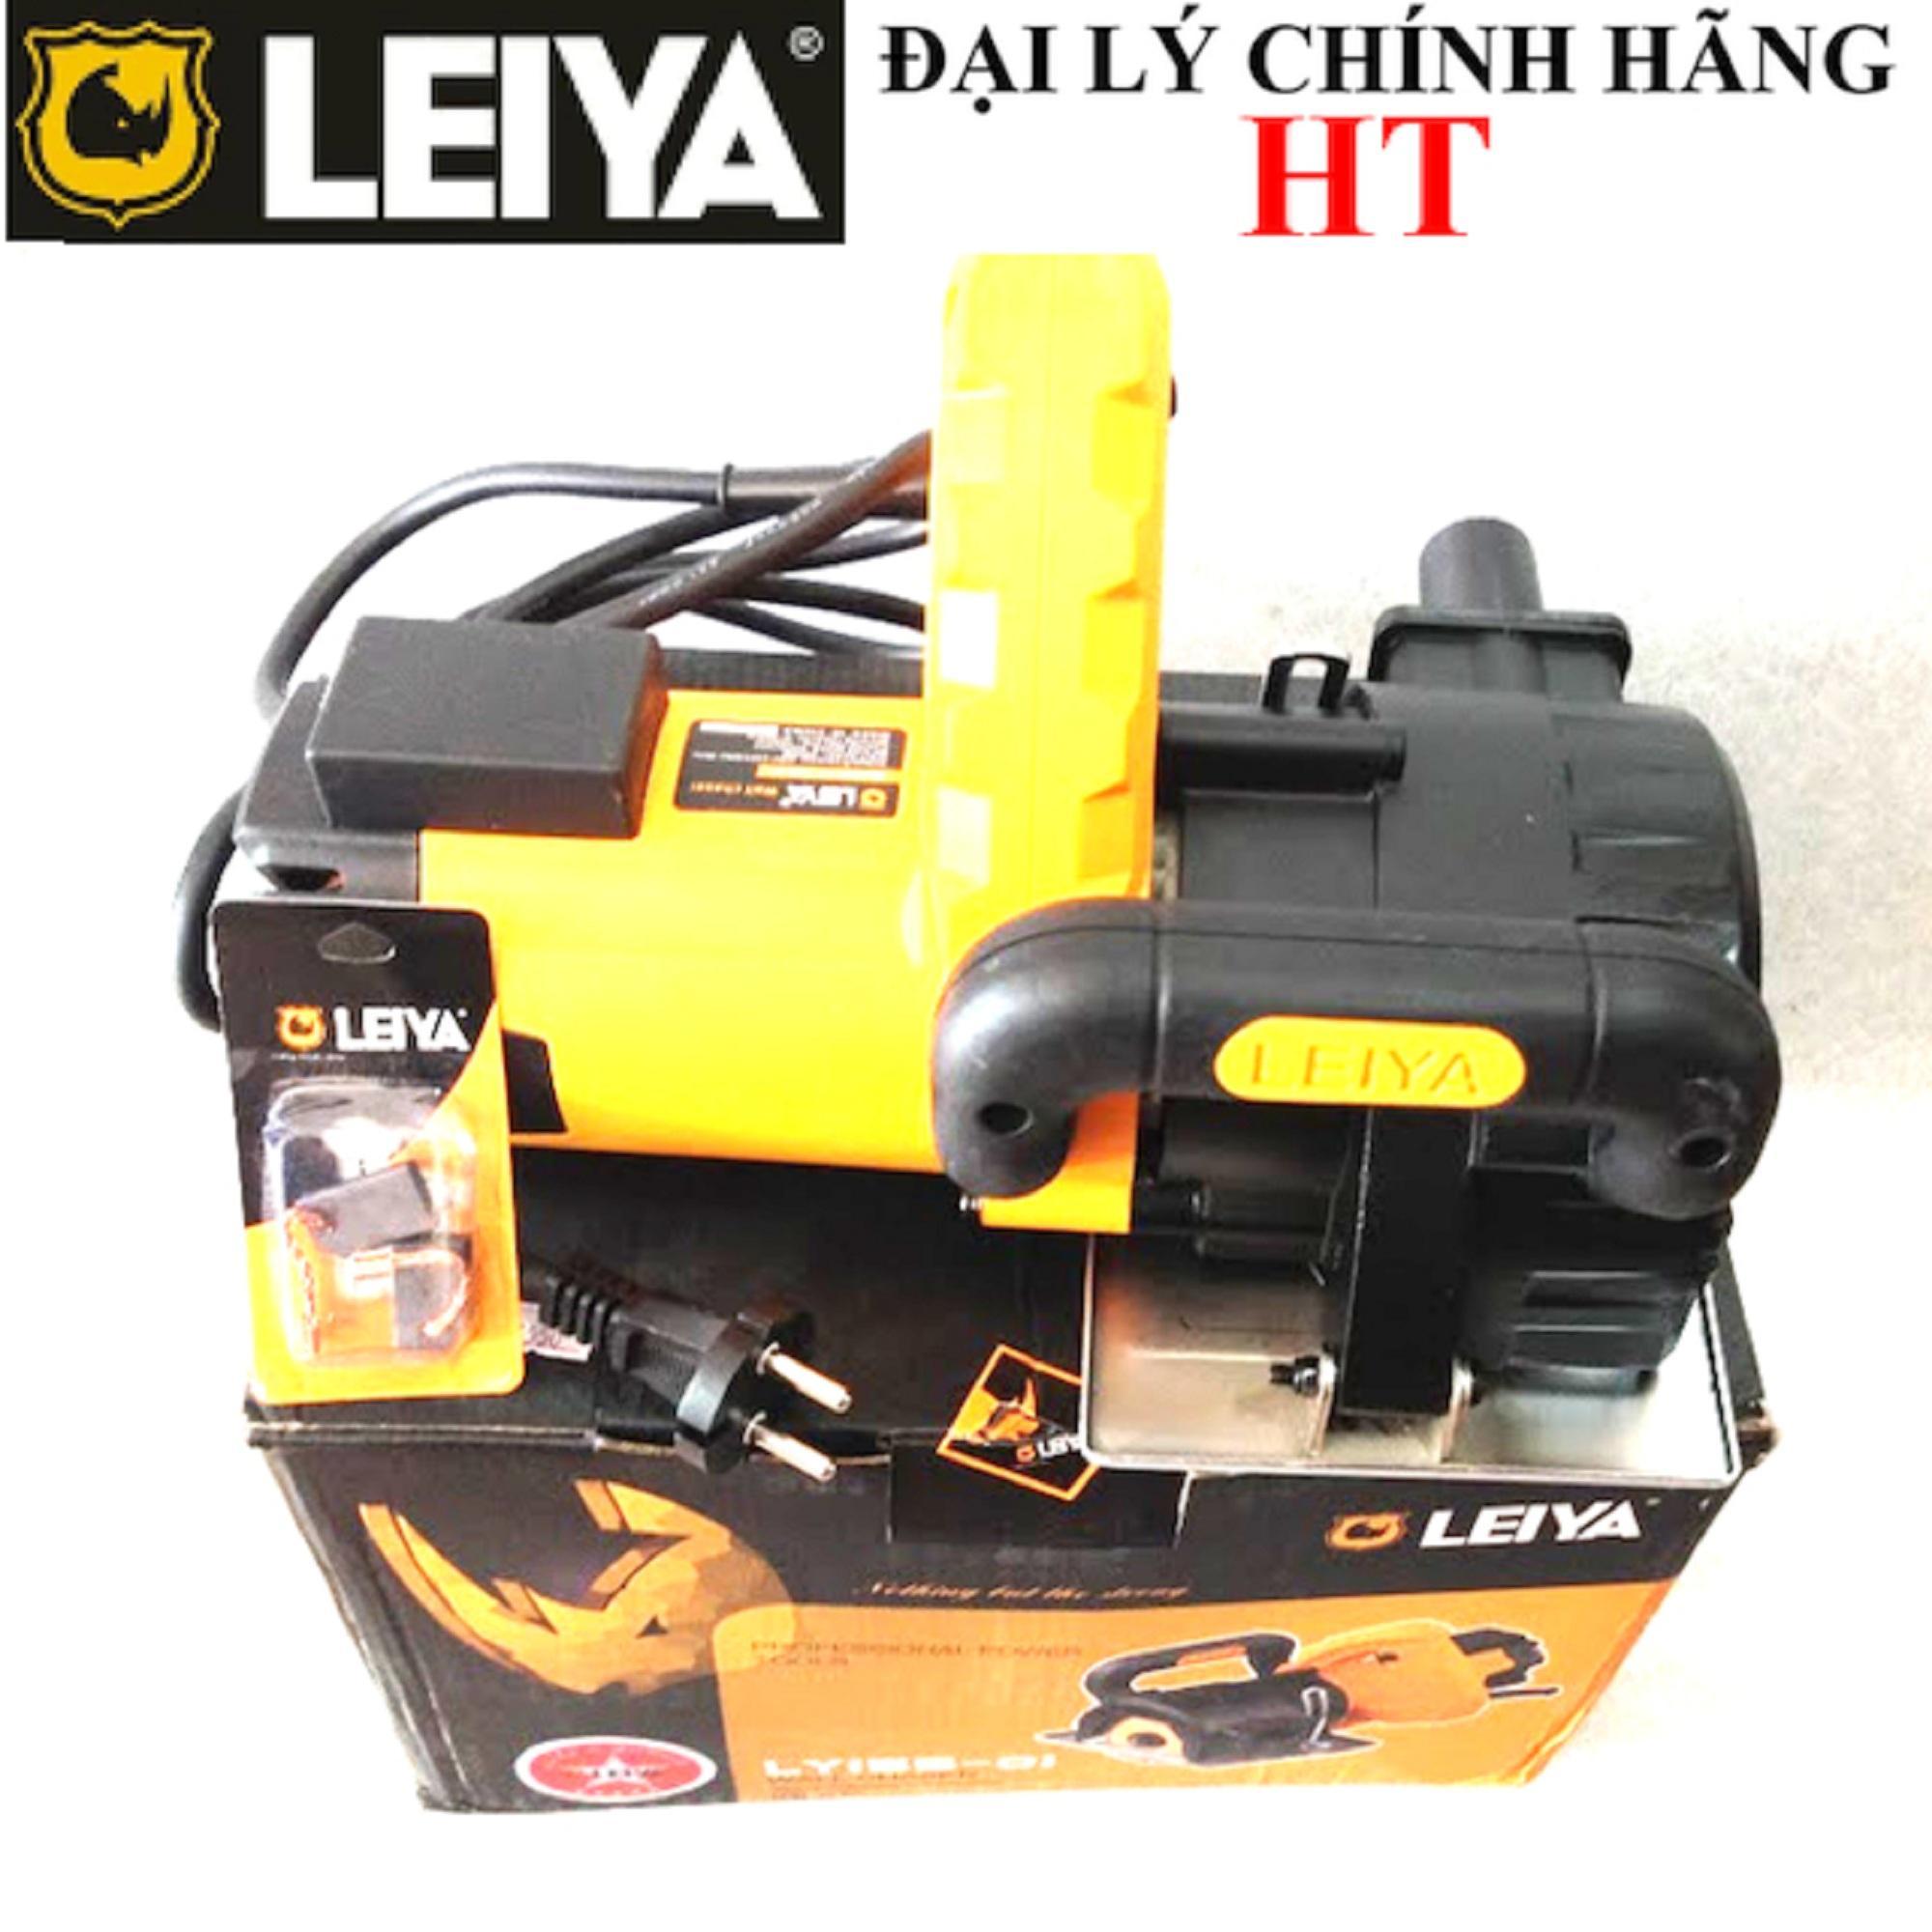 Máy cắt rãnh tường 5 lưỡi LEIYA LY155-01